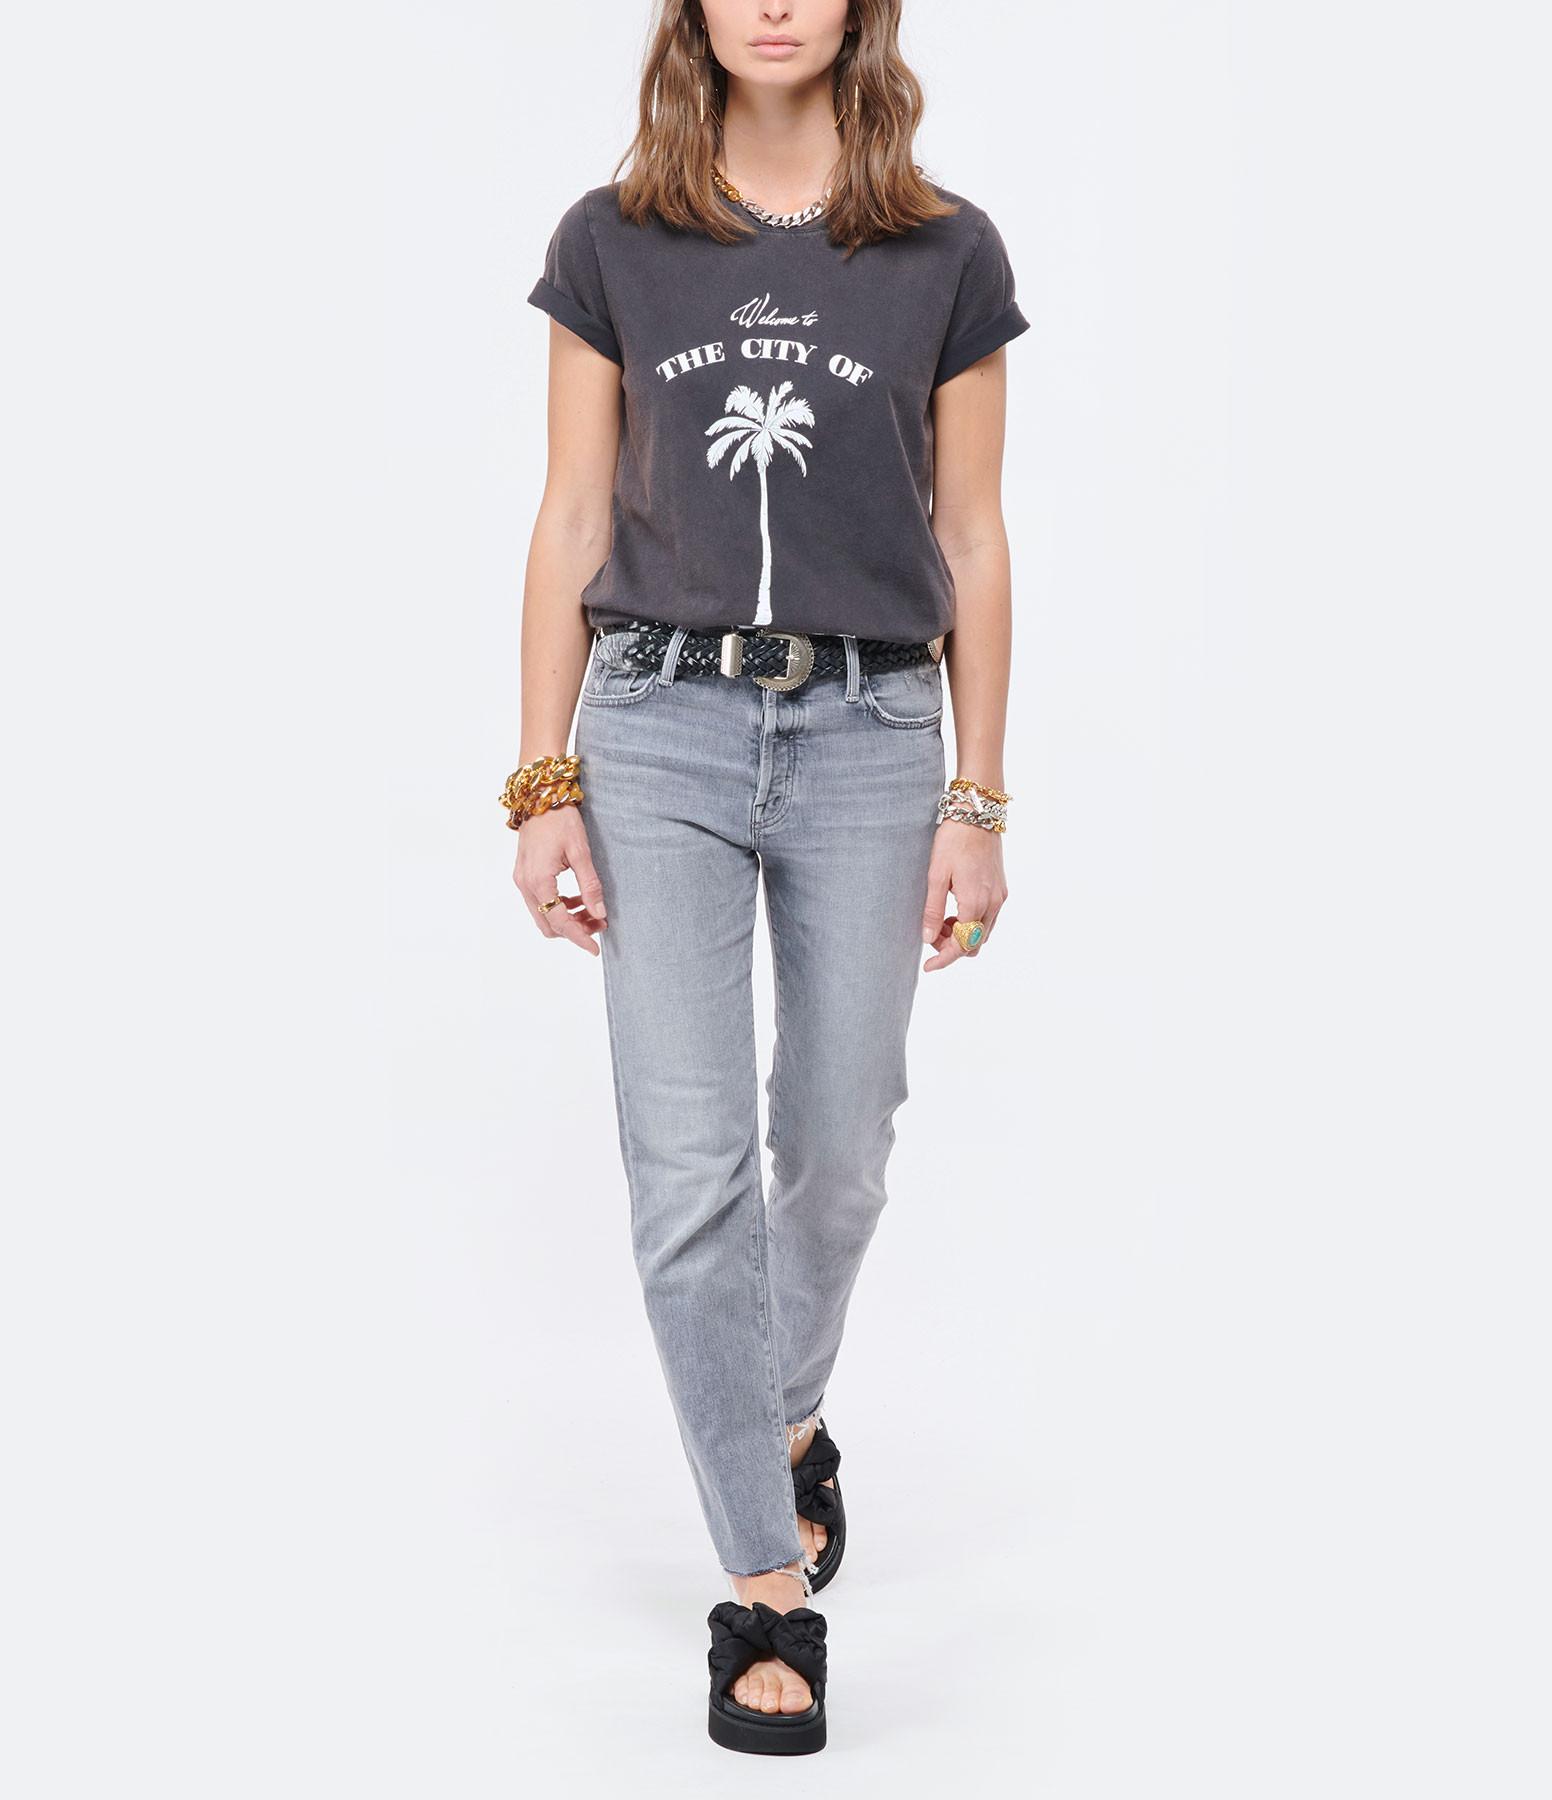 RAIINE - Tee-shirt Somo Coton Biologique Gris